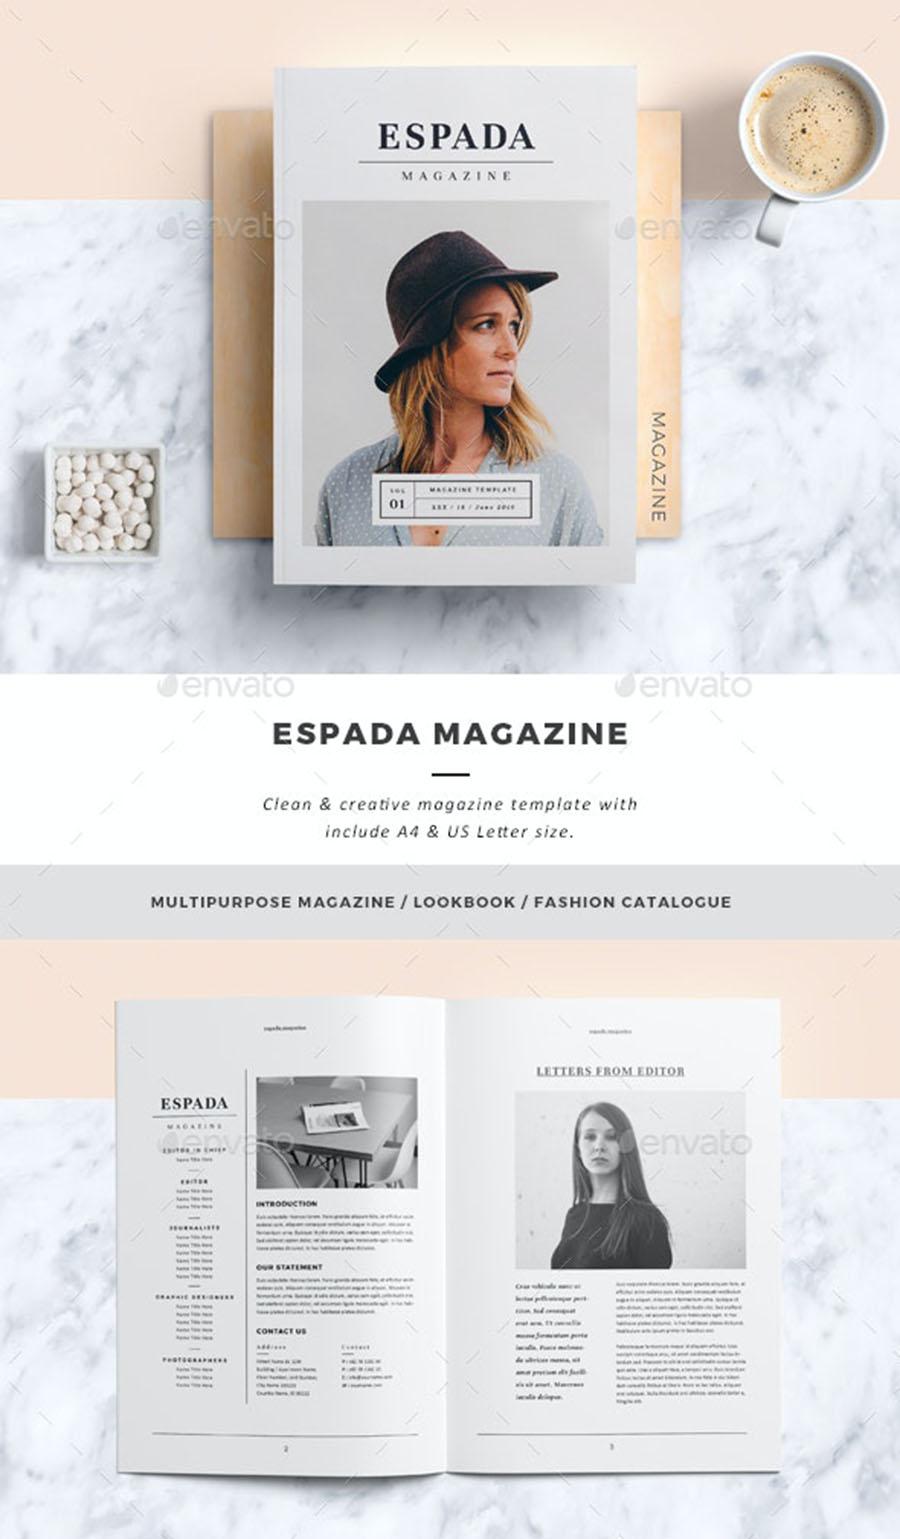 ESPADA InDesign Magazine Template